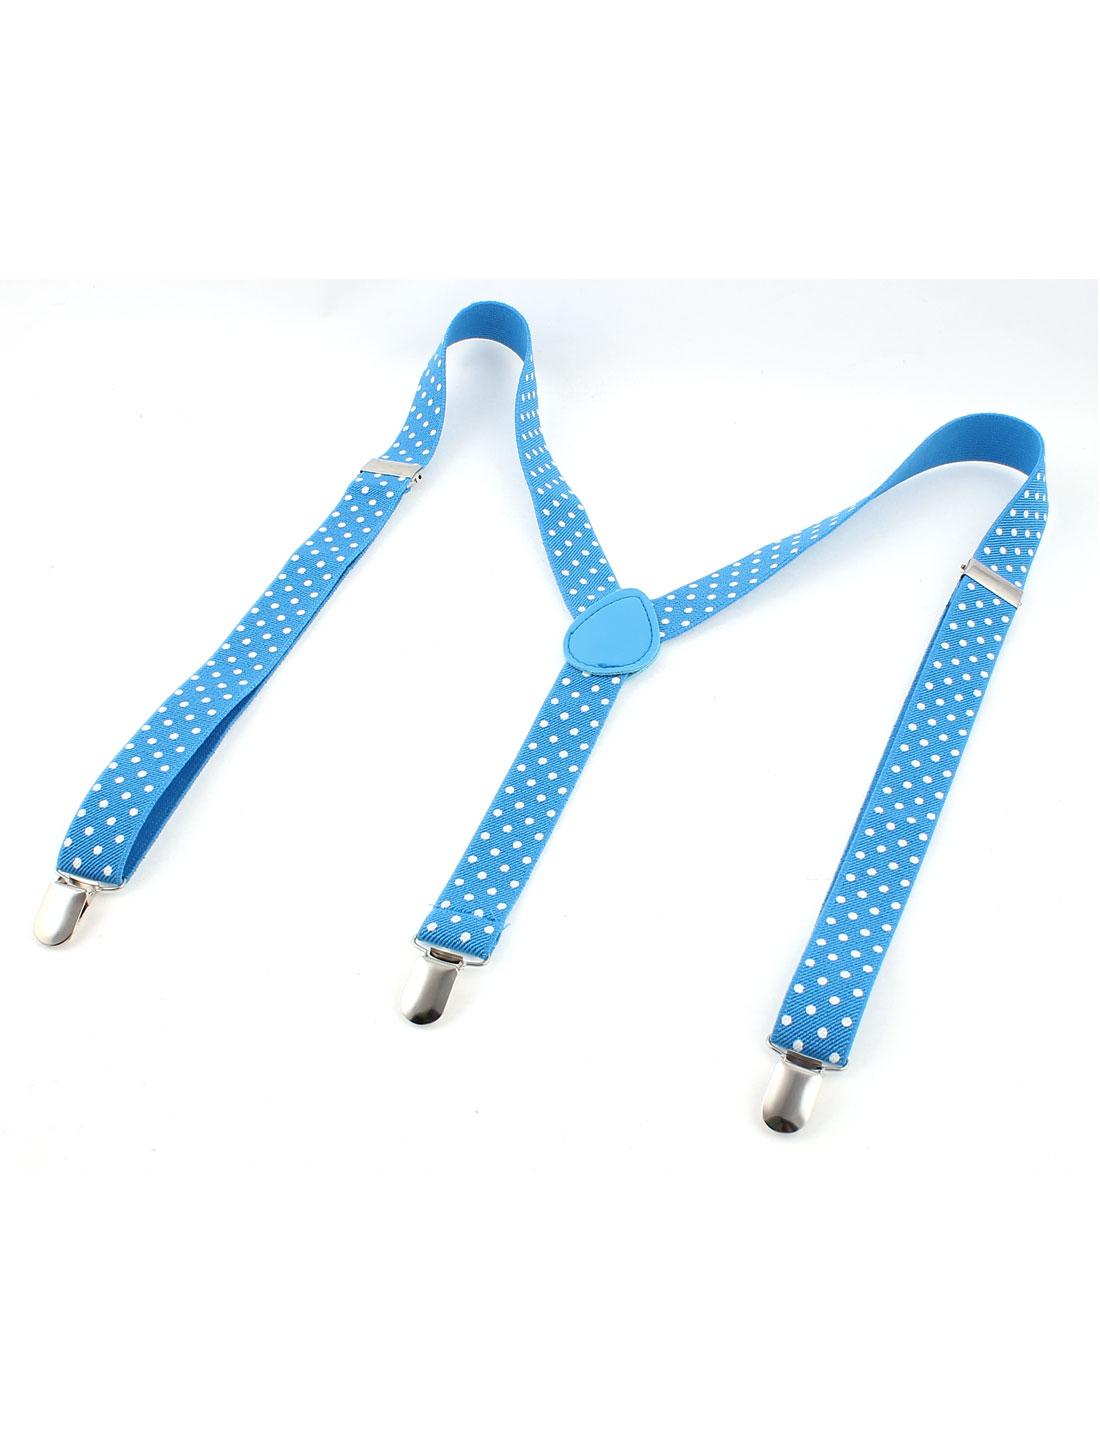 White Dots Print Y Shape Elastic Adjustable Clip Galluses Suspender Braces Blue